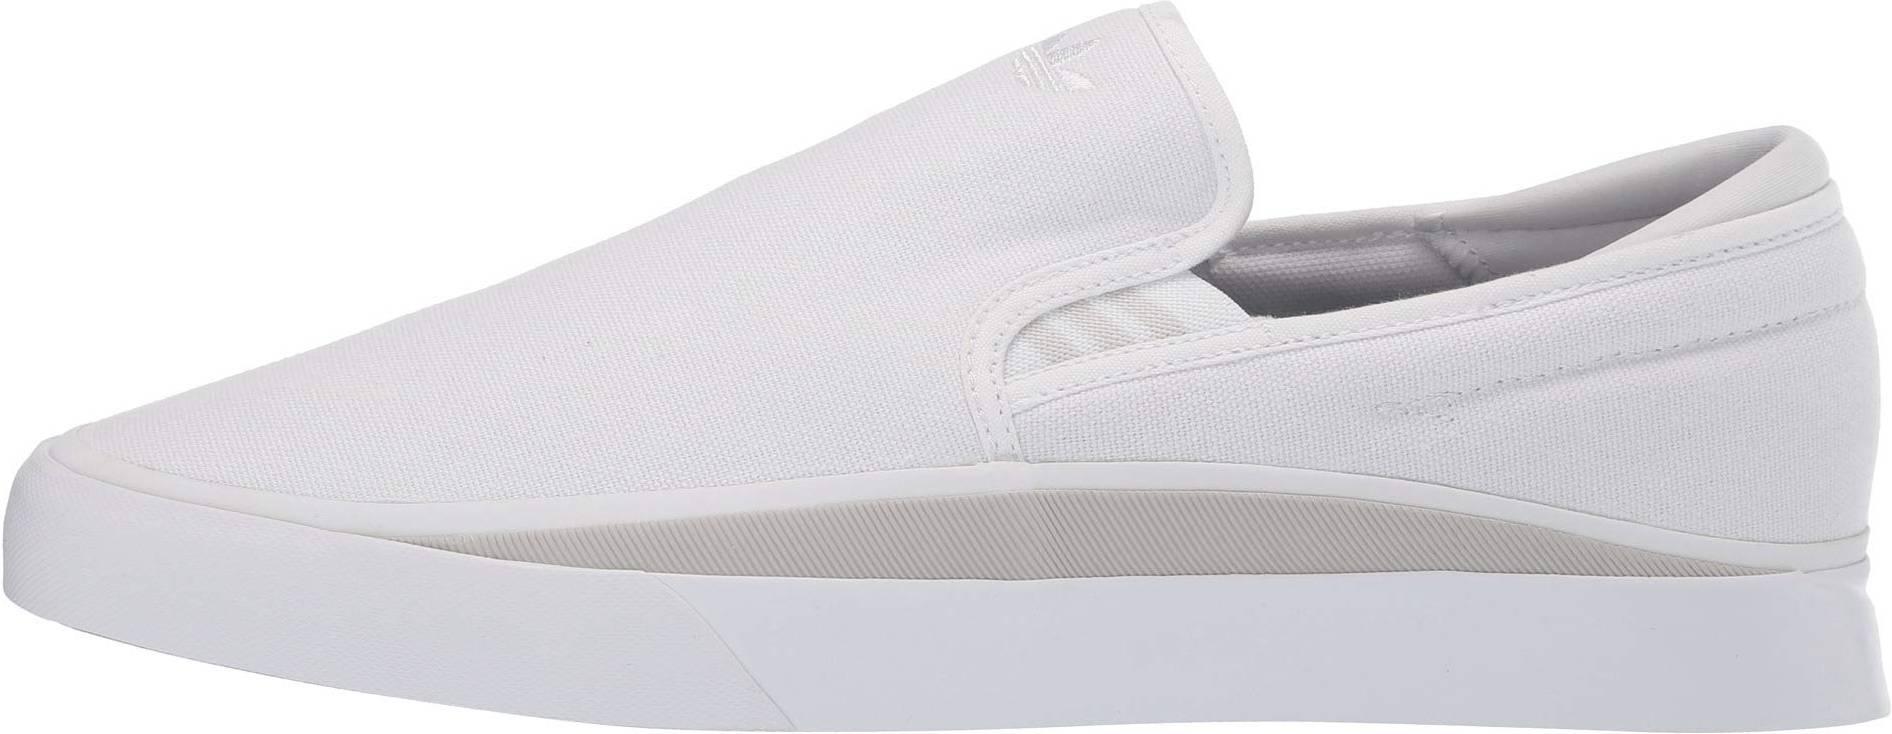 Adidas Sabalo Slip-On